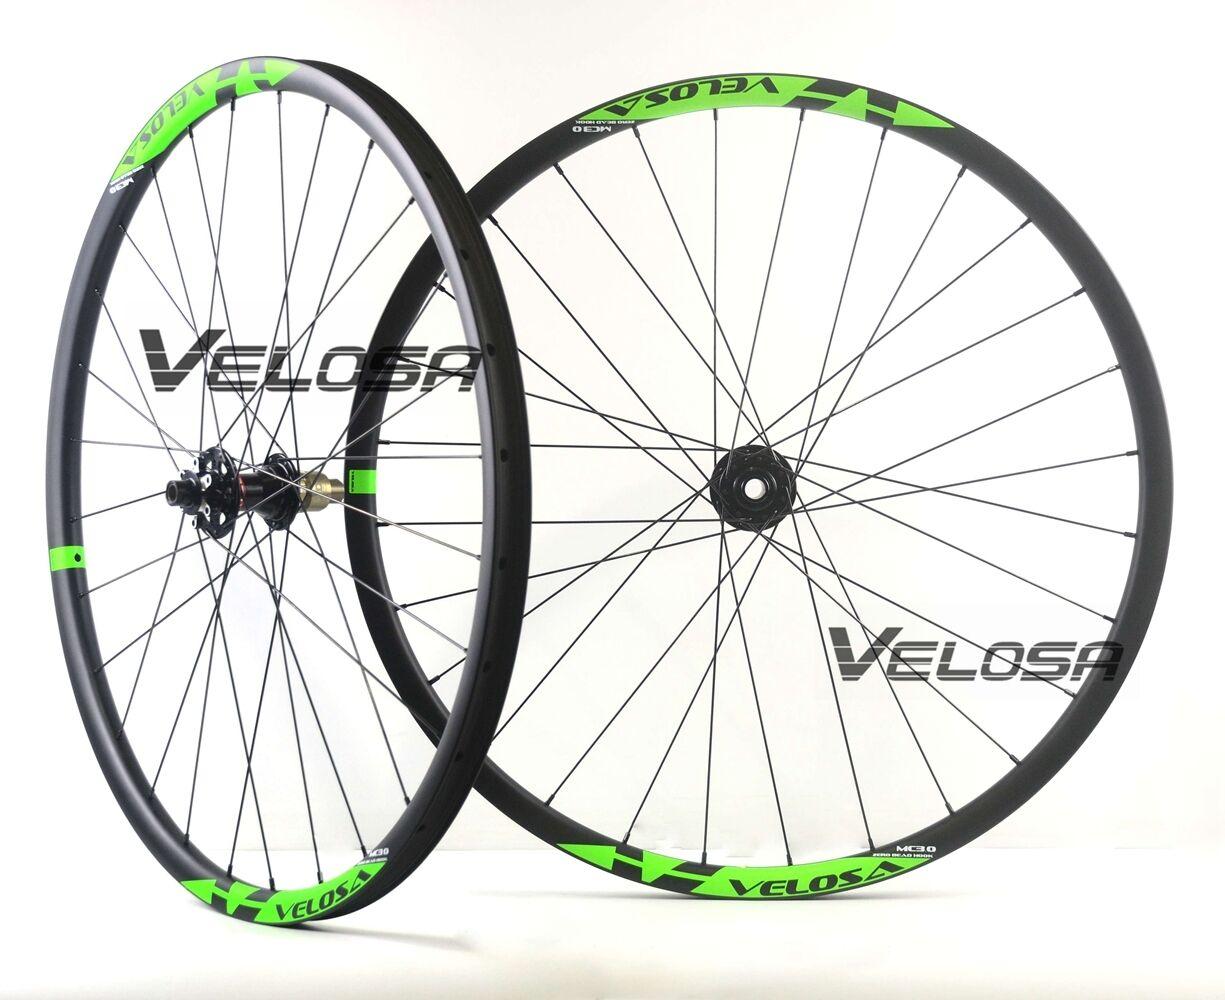 Super light 29er MTB XC boost carbon wheels 29inch asymmetric MTB wheelset boost